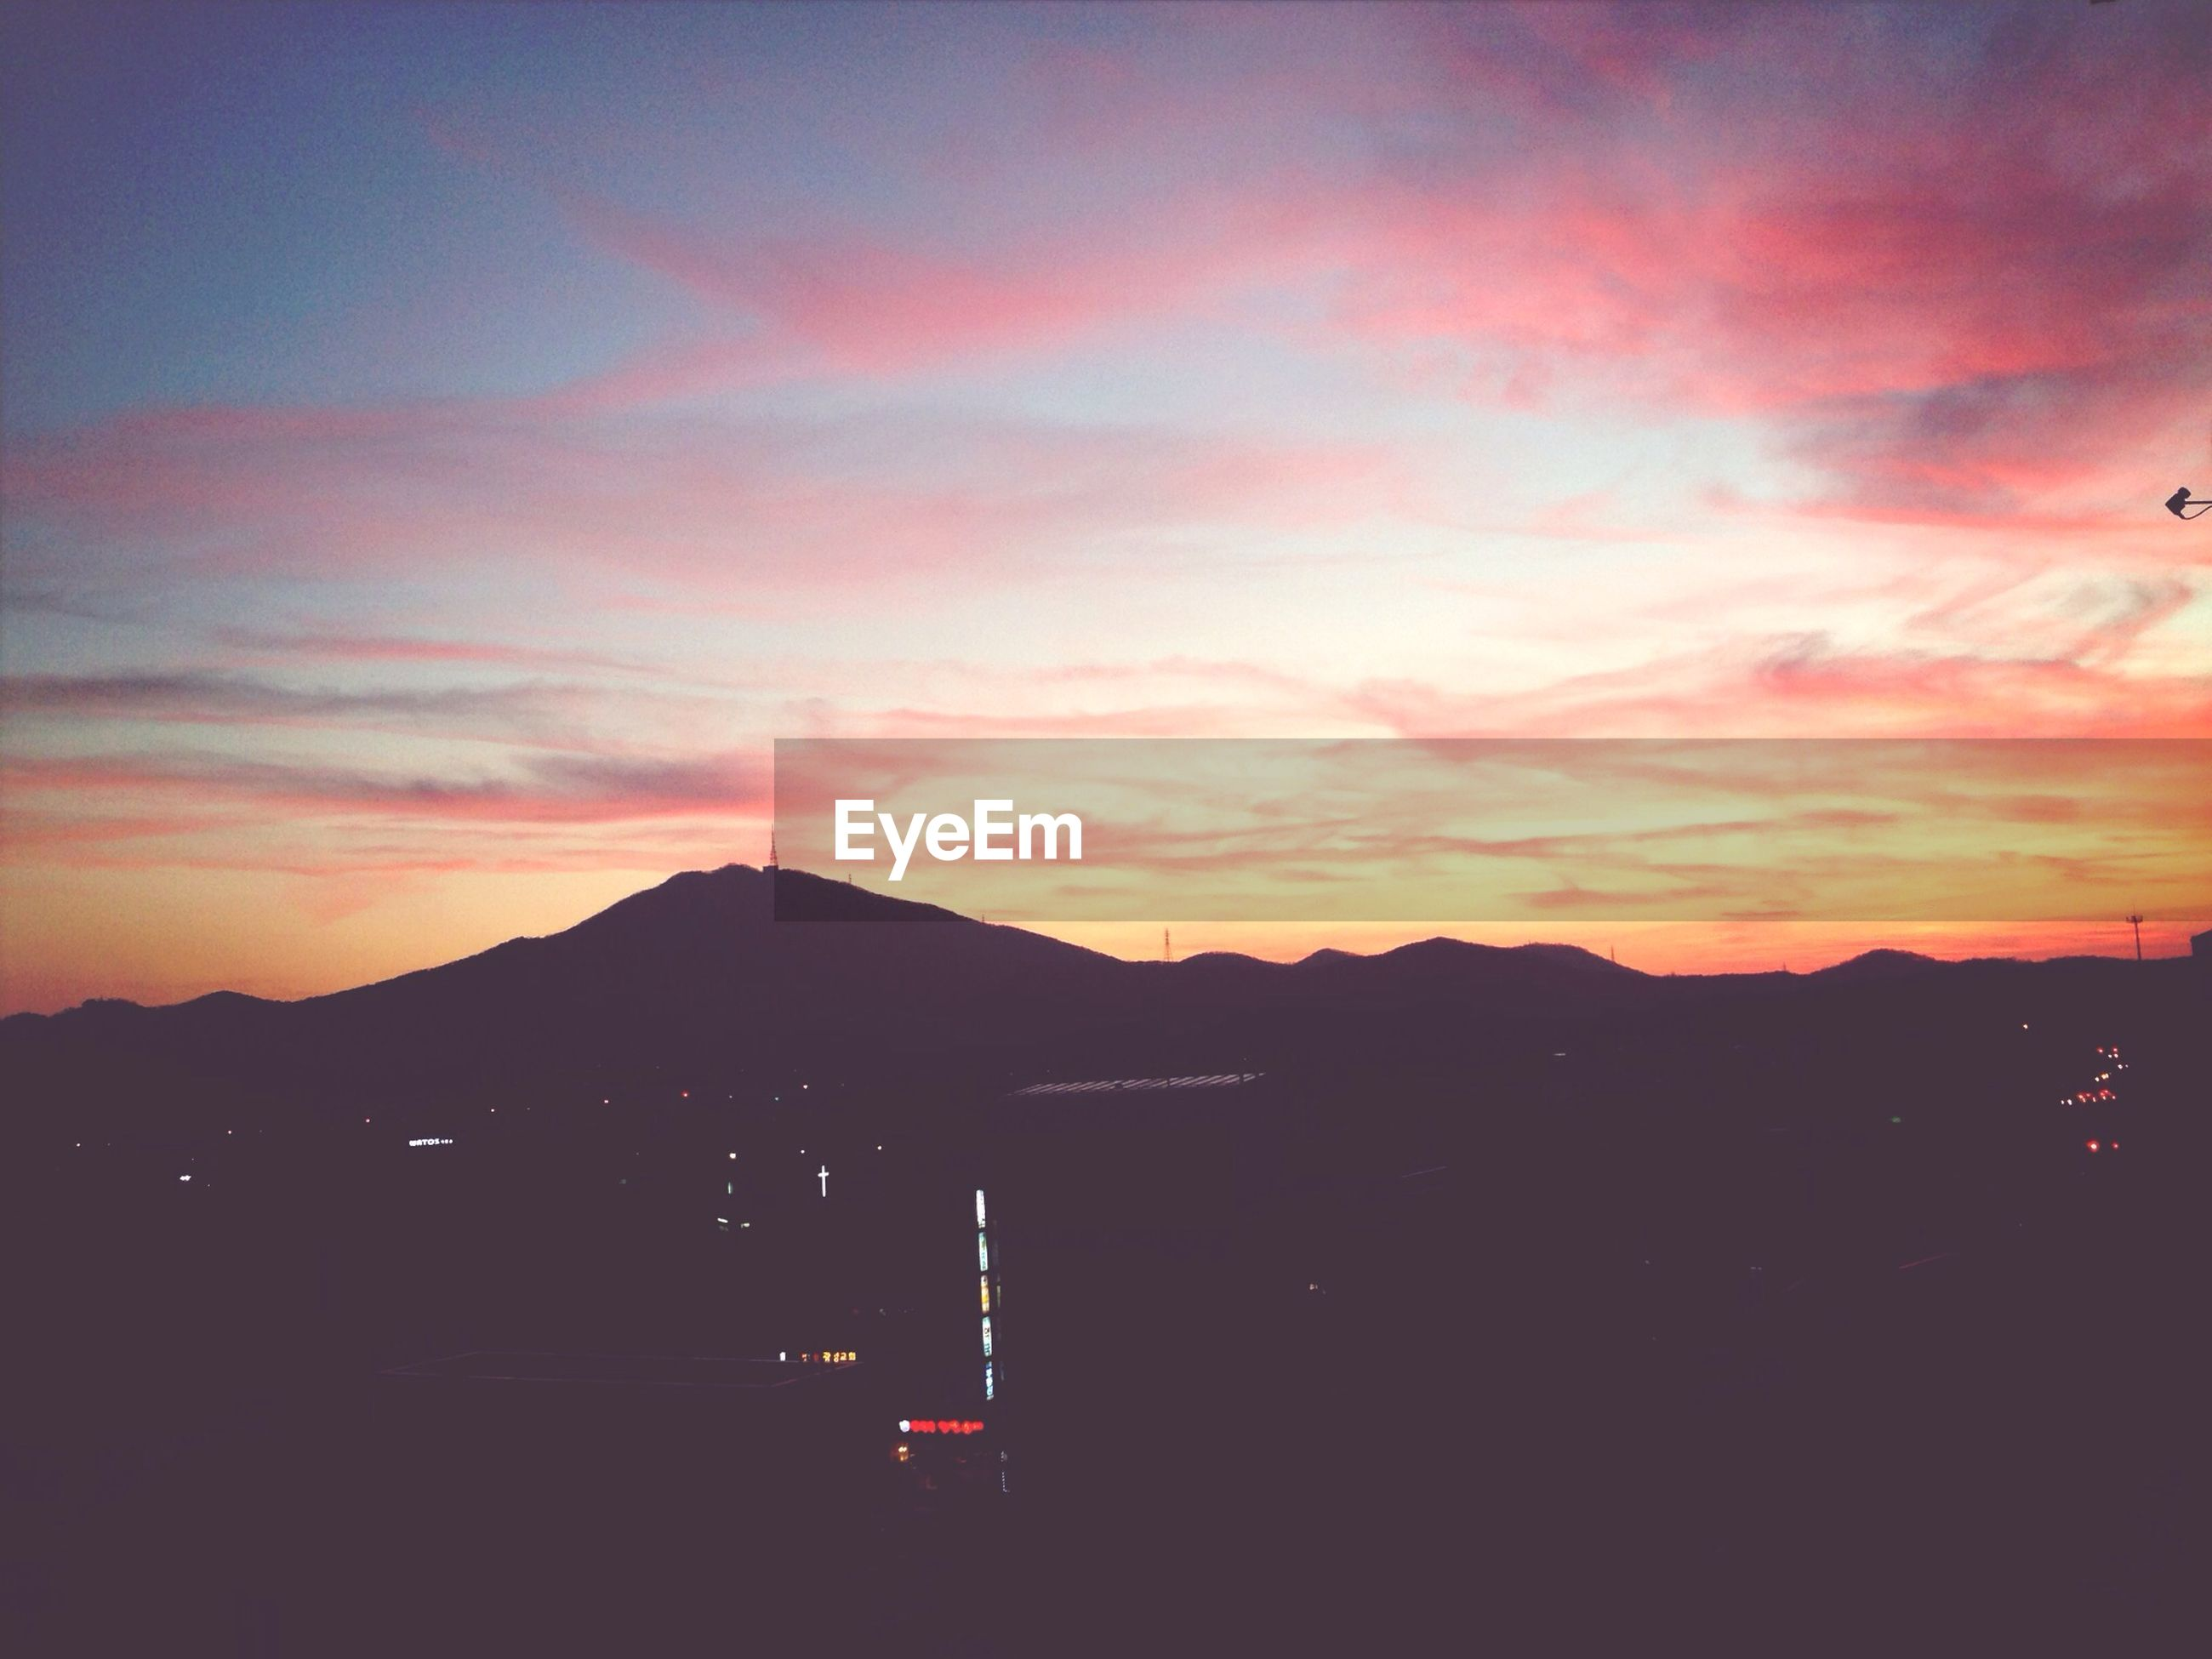 sunset, mountain, silhouette, sky, mountain range, scenics, cloud - sky, beauty in nature, orange color, tranquil scene, tranquility, nature, dusk, cloud, landscape, dramatic sky, idyllic, cloudy, dark, outdoors